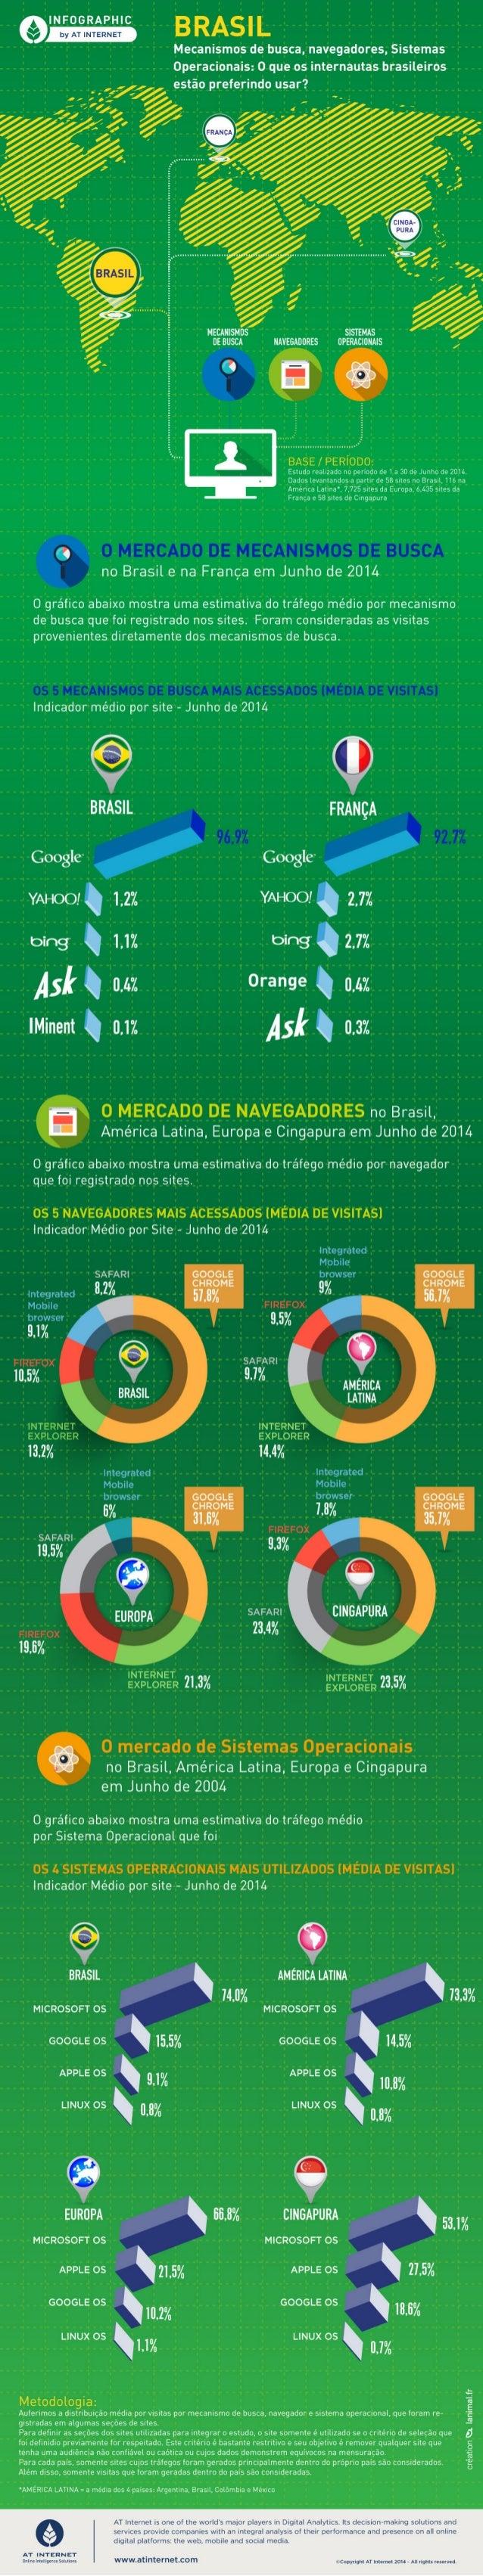 [Infográfico - Junho de 2014] Brasil: Mecanismos de busca, navegadores, Sistemas Operacionais